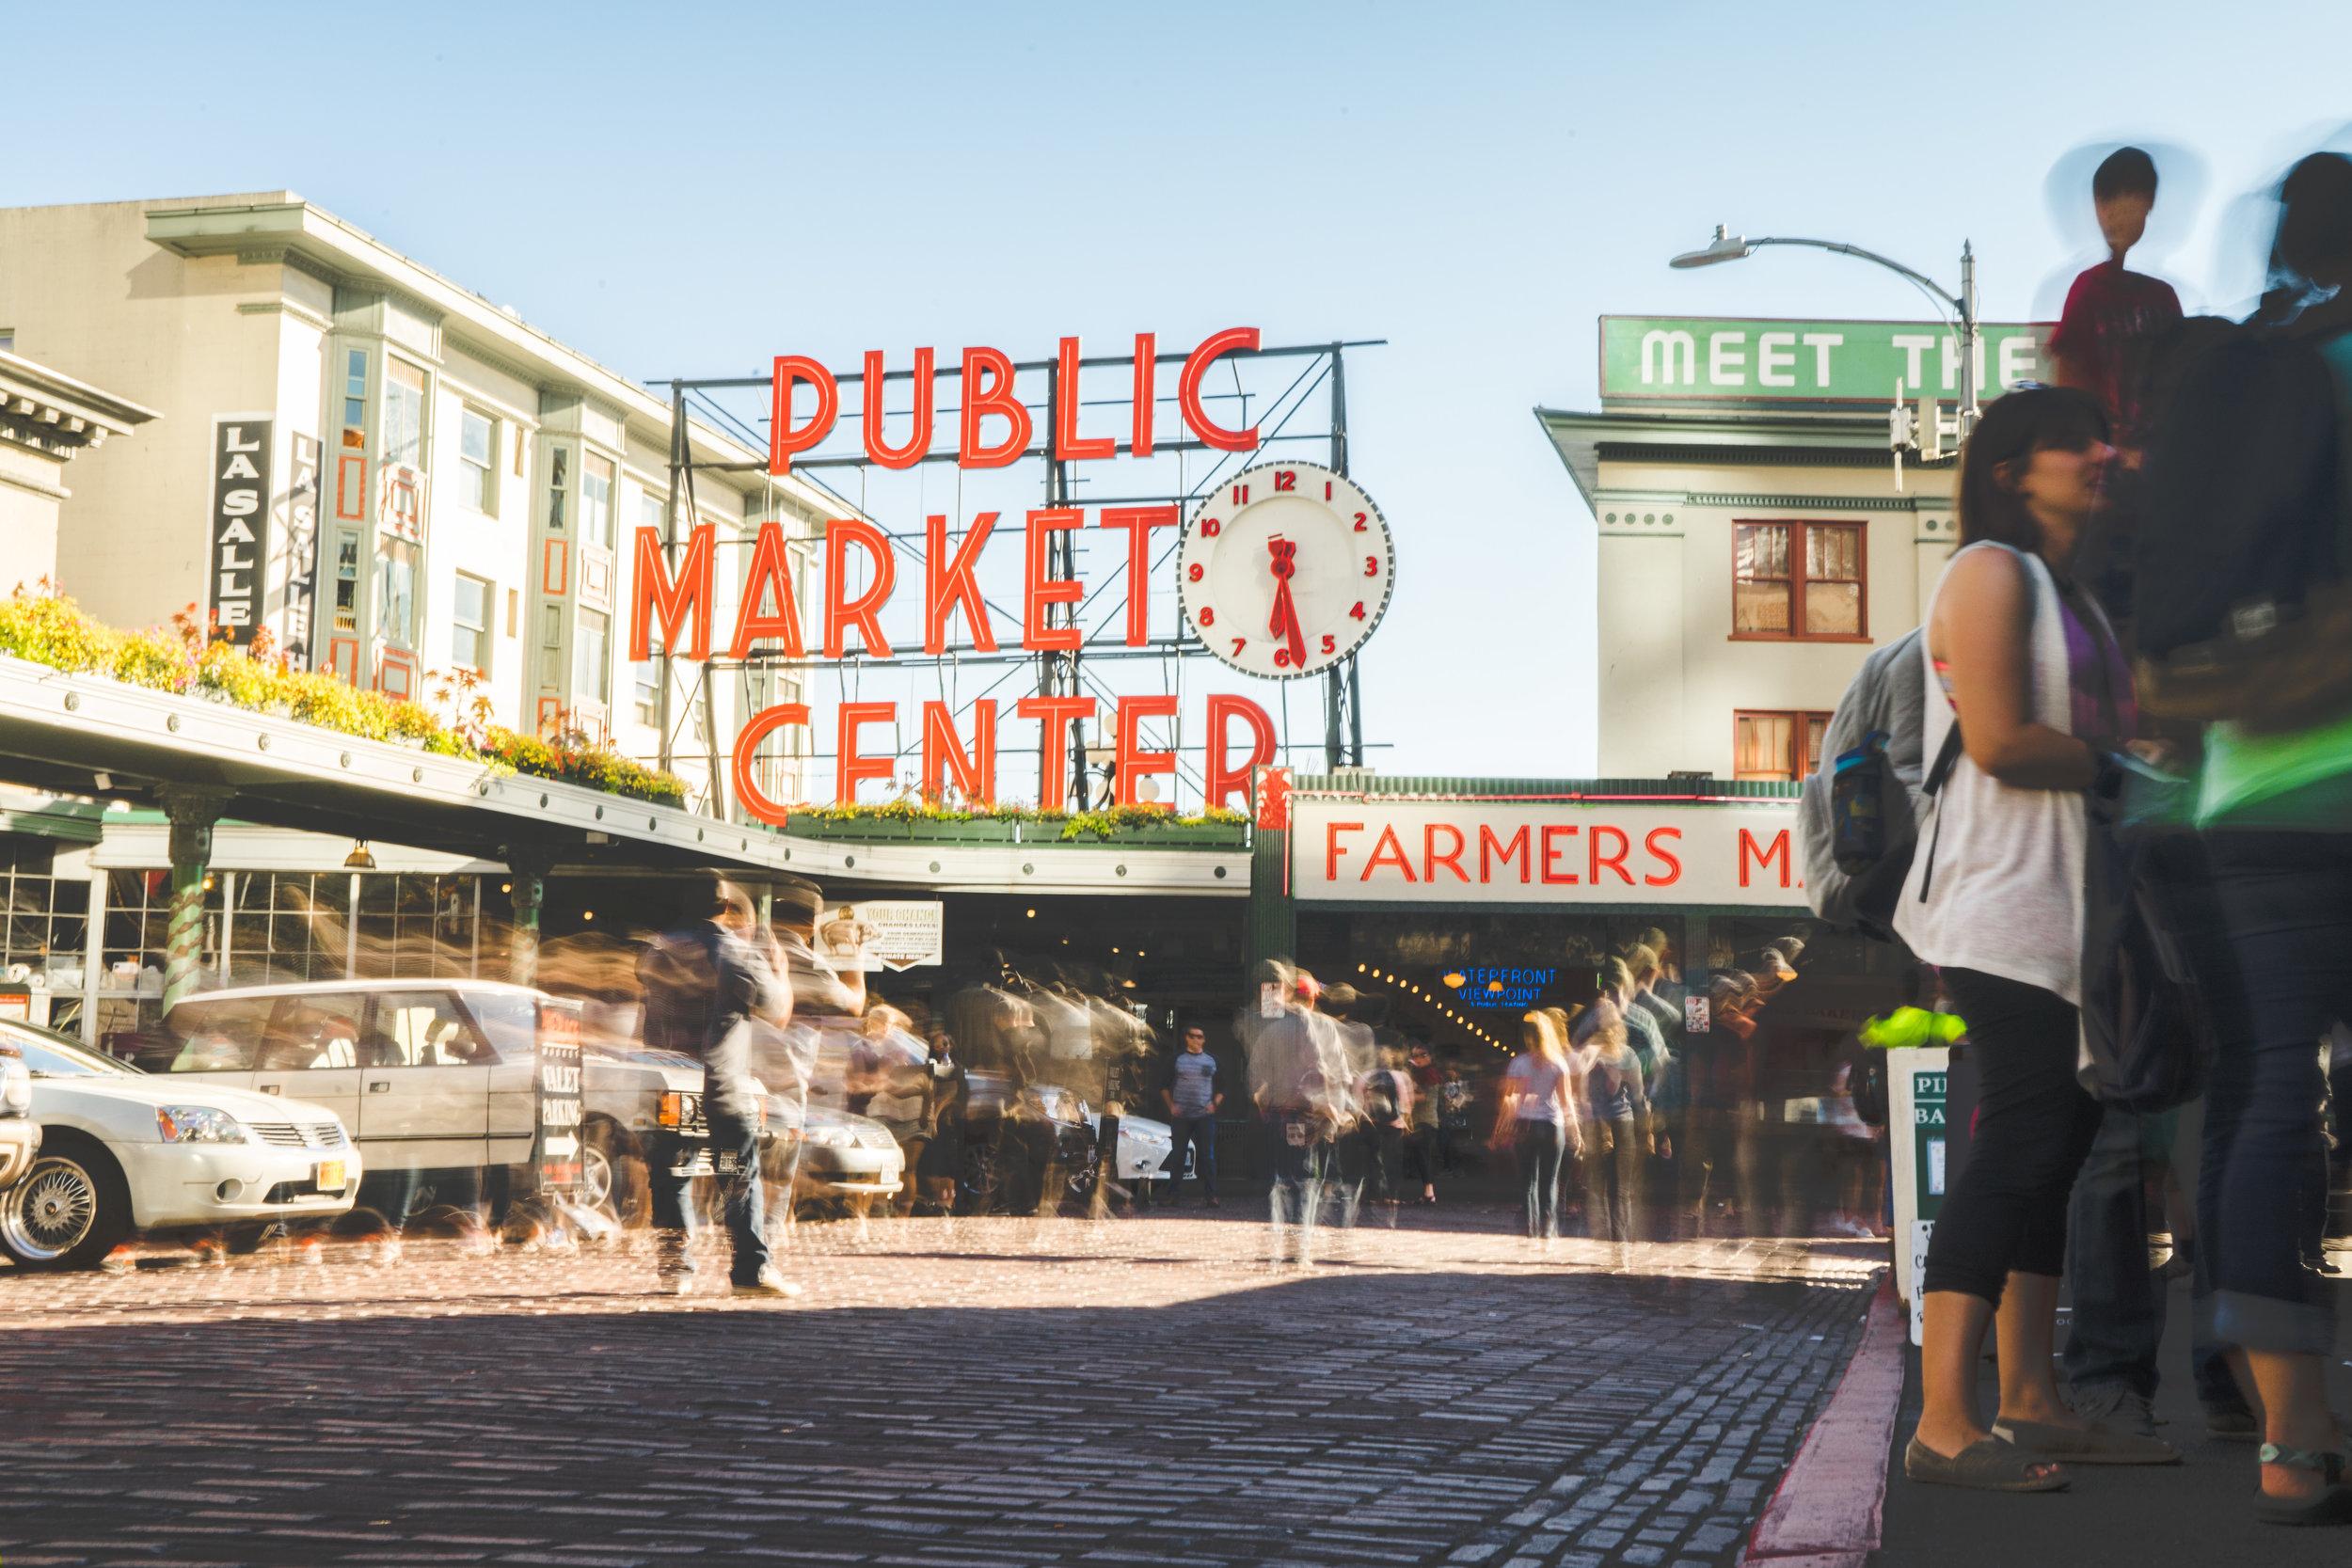 Pike Public Market Center.jpg